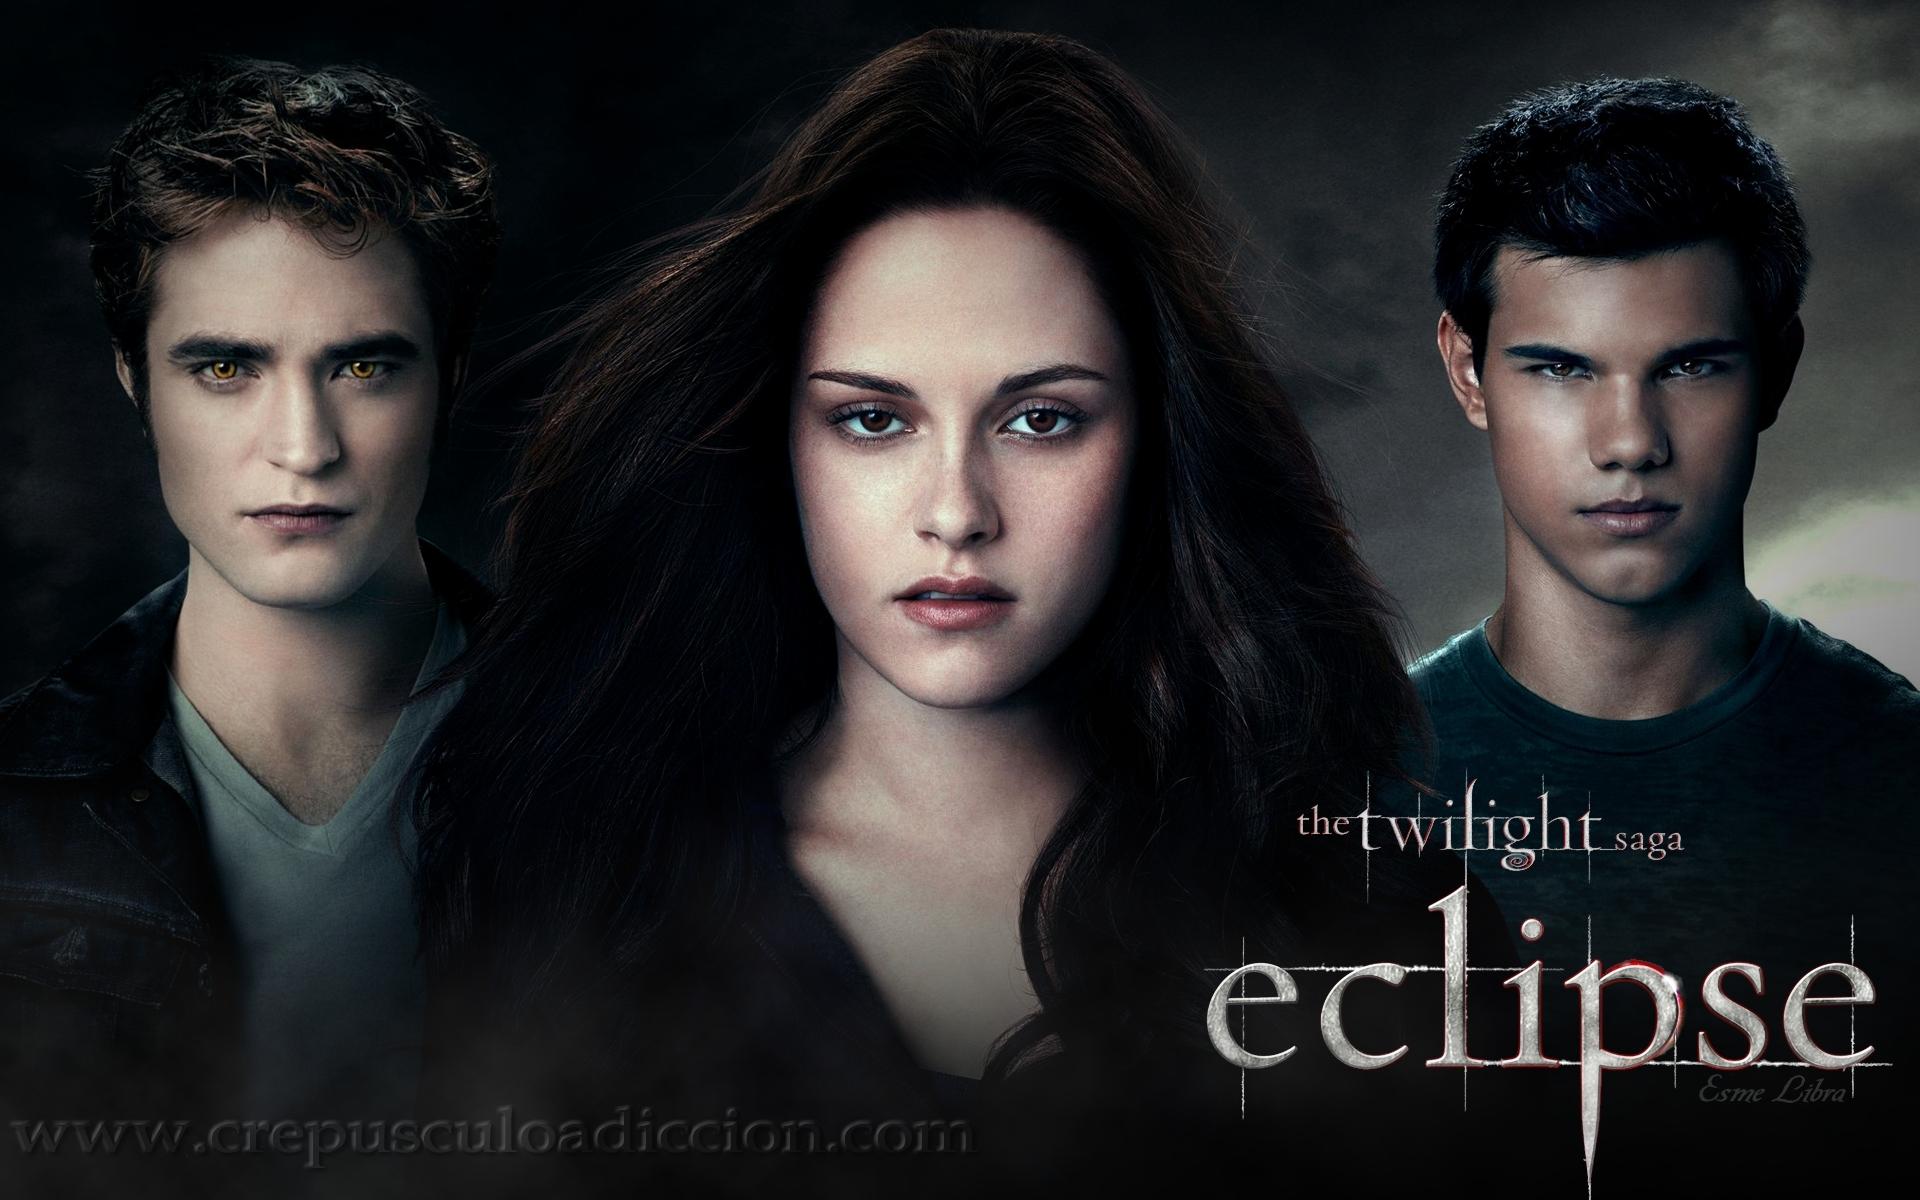 Twilight saga wallpapers twi hards fanpires wallpaper - Twilight wallpaper ...